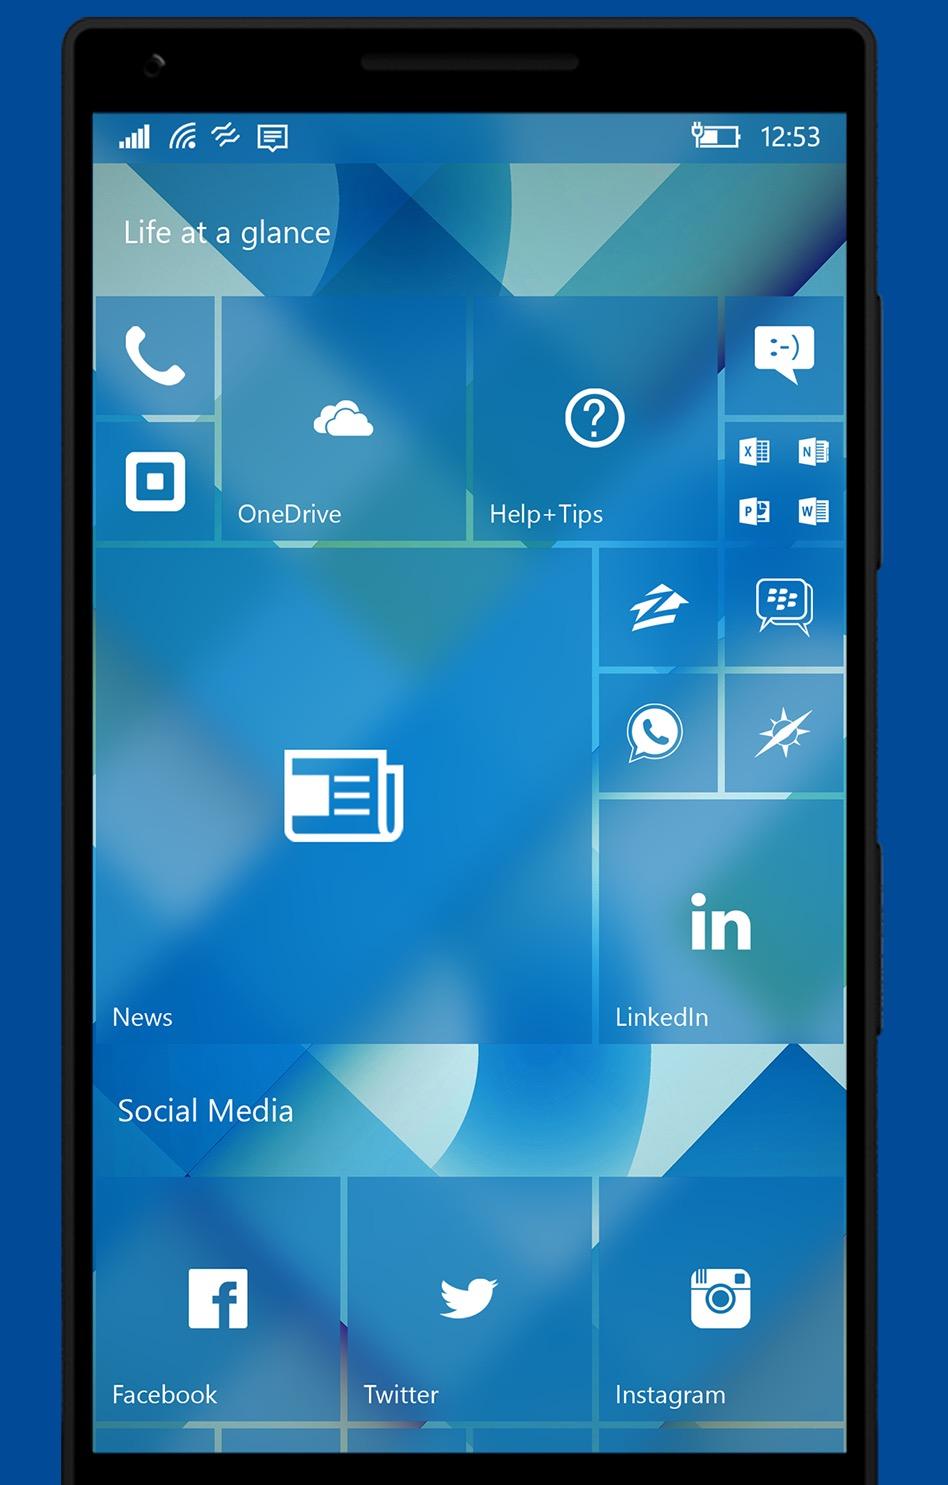 Windows 10 Mobile, Windows 10 Mobile Features, Windows 10 Smartphones, Windows 10 Mobile Features Lacking, Windows 10 Mobile Expected Features, Windows 10 Mobile Night Mode Feature, Windows 10 Mobile Updated Emoji Feature, Windows 10 Mobile Pick Up Where You Left Feature, Windows 10 Mobile Customized Tile Feature